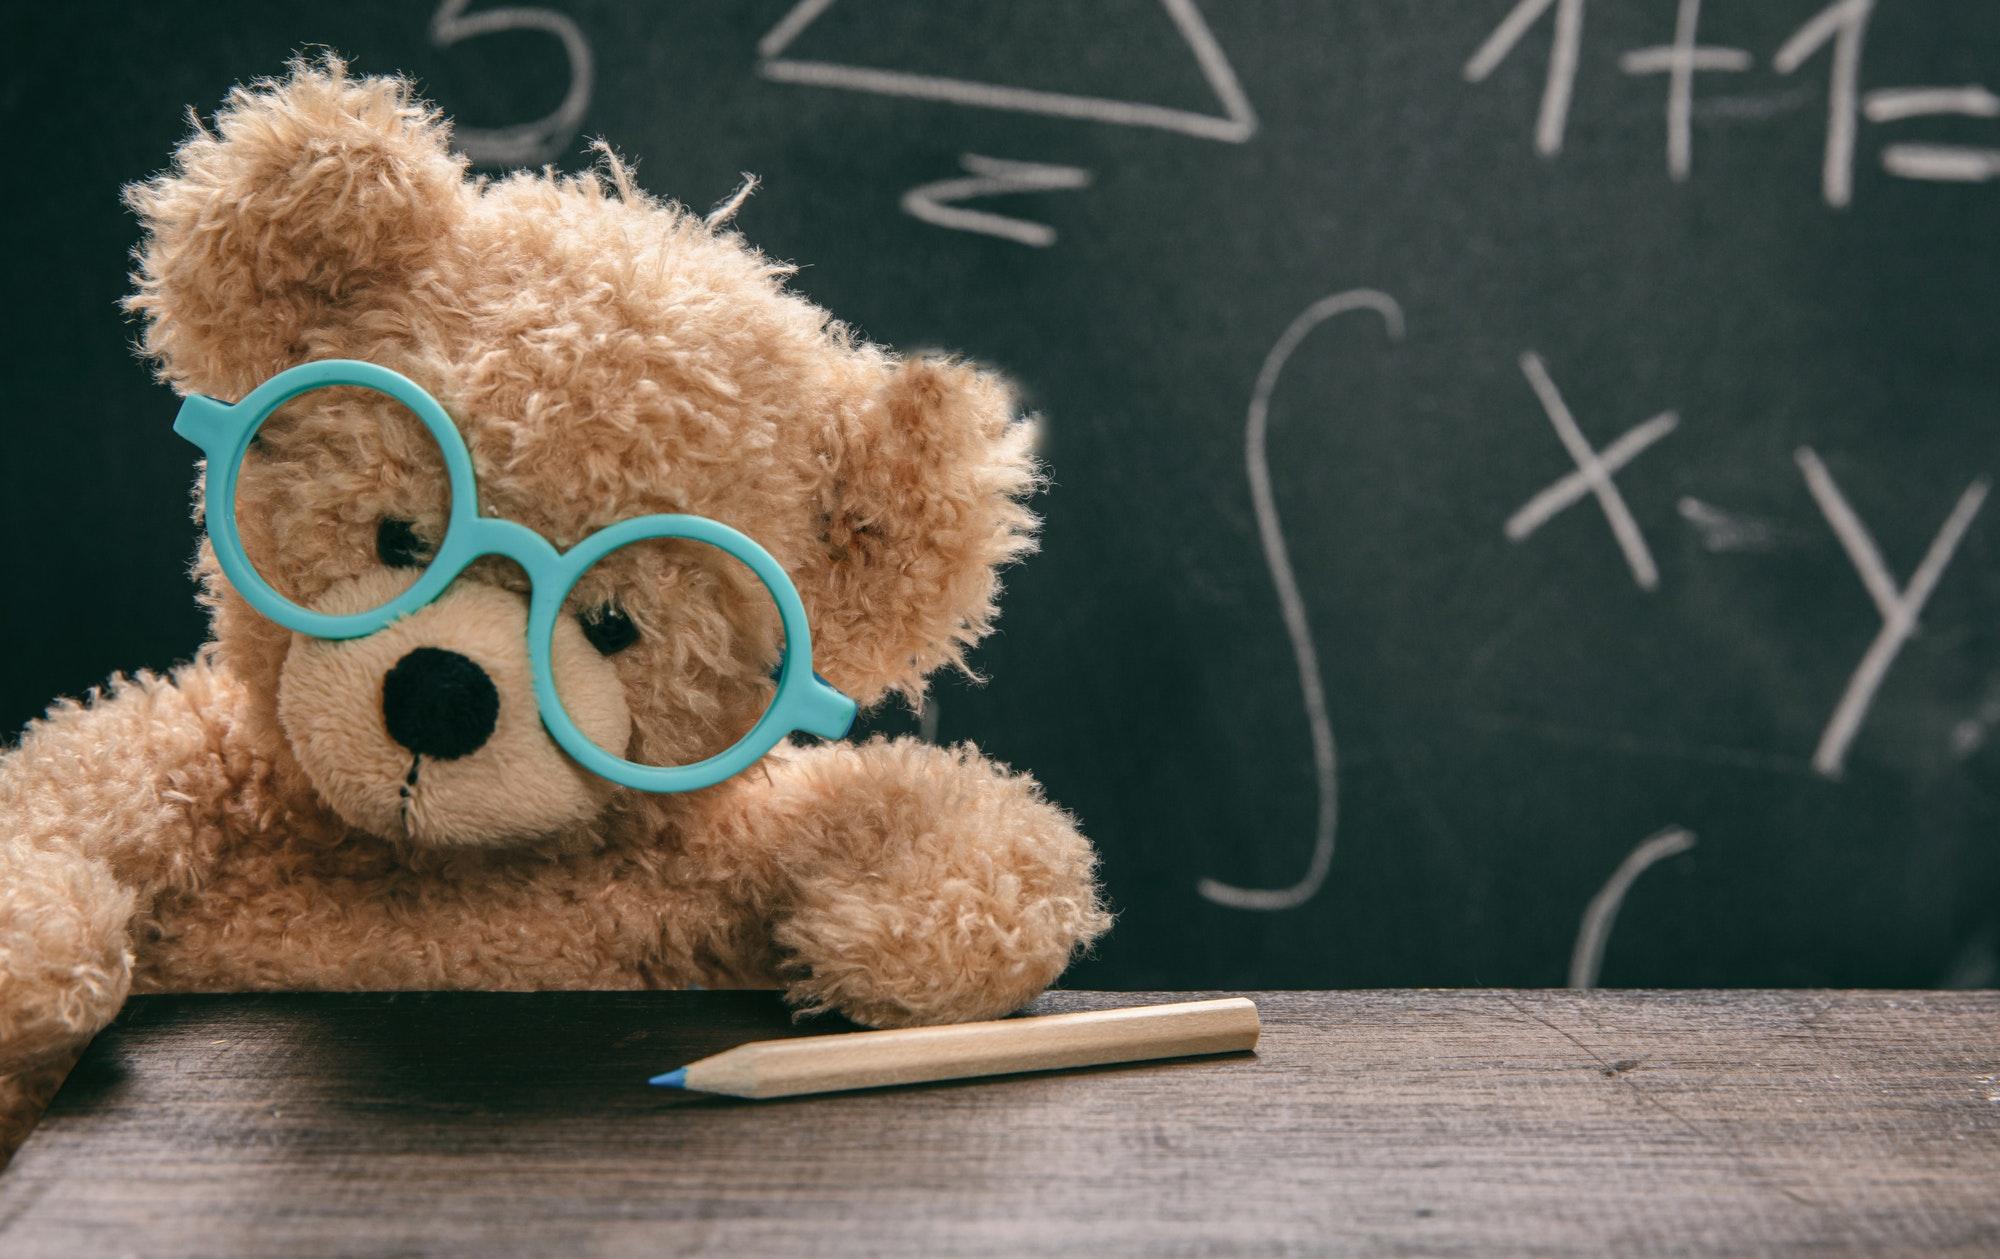 Math test. Cute teddy wearing glasses and black chalkboard